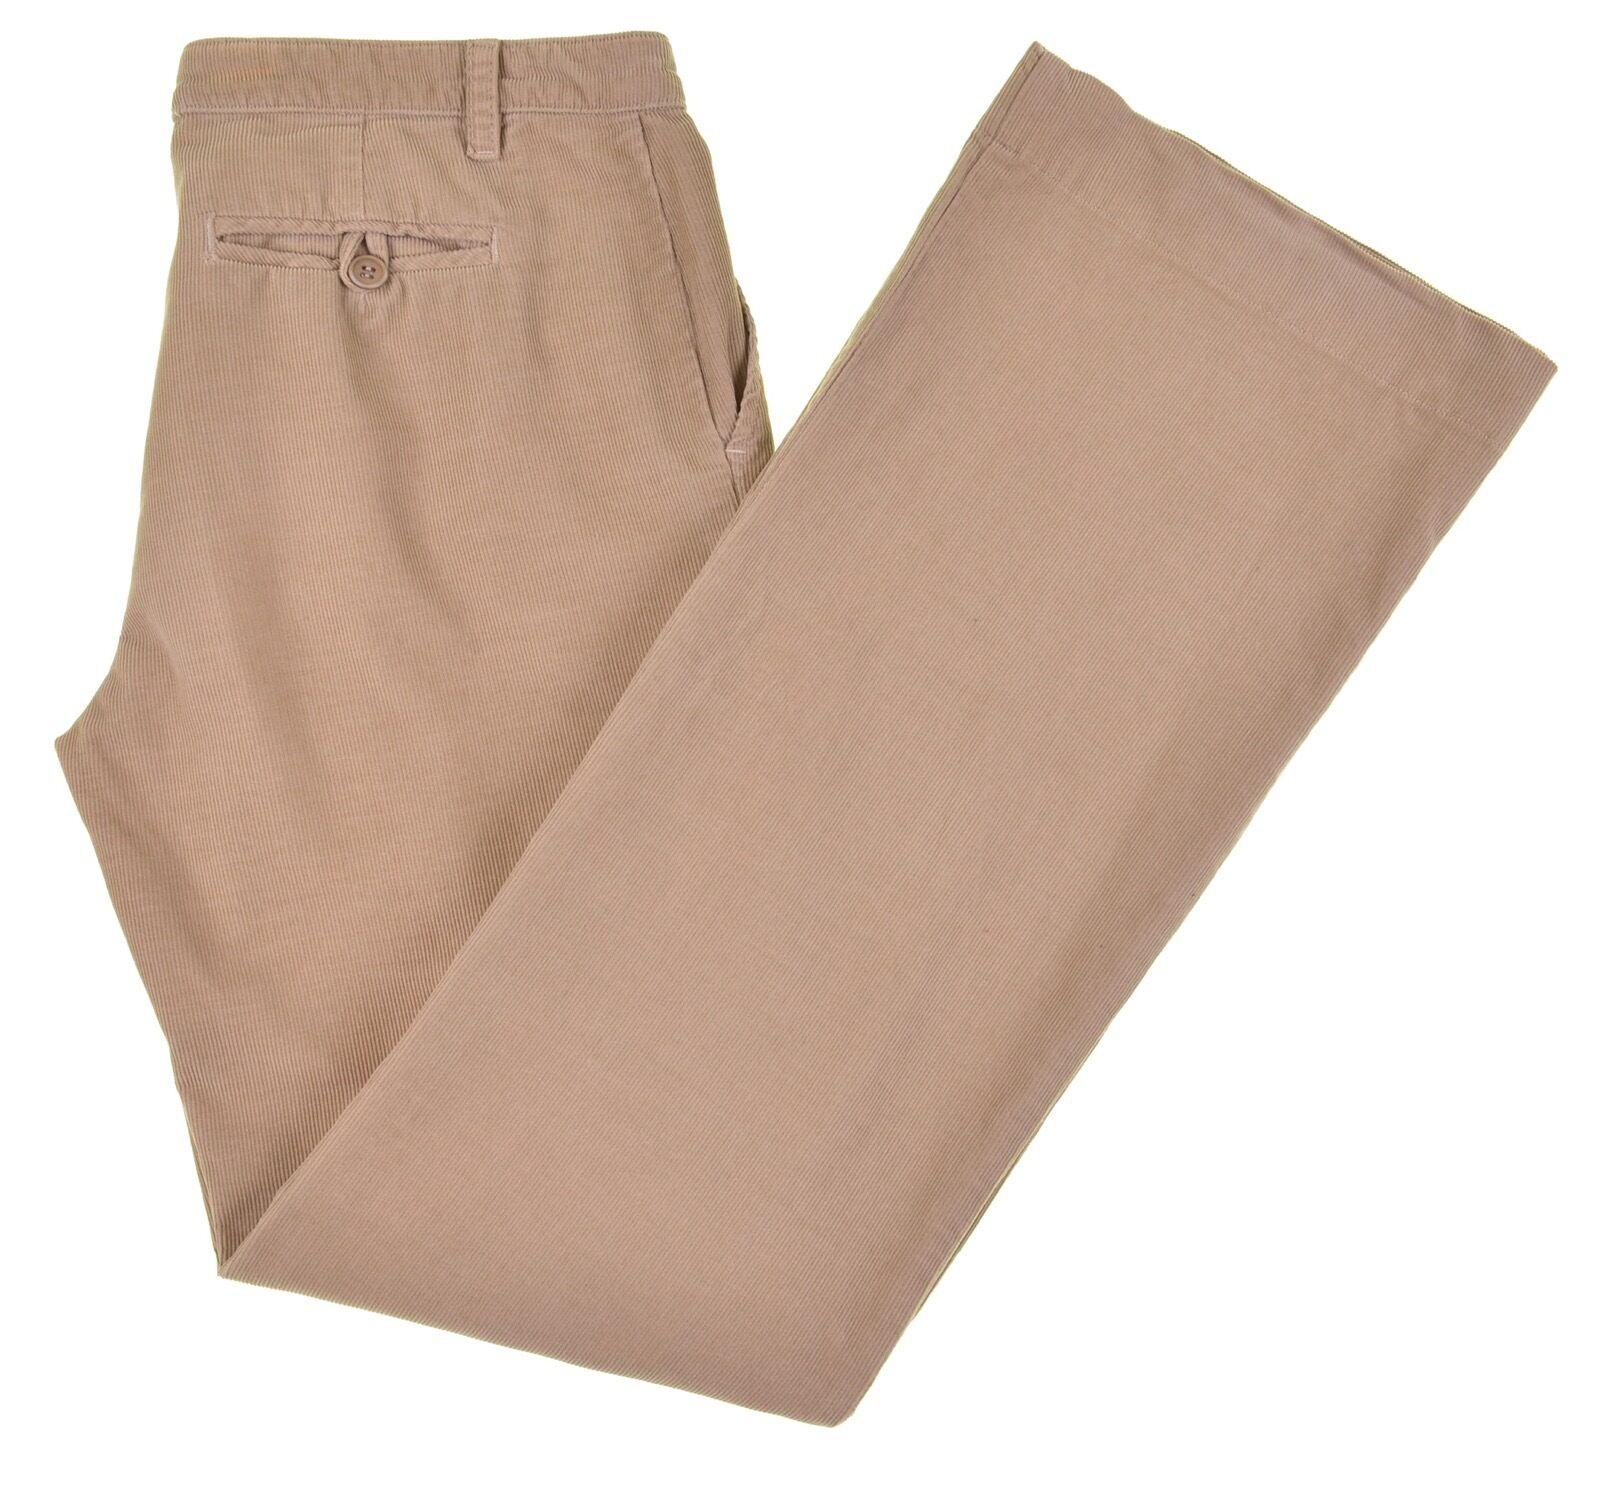 James Perse Khaki Tan Cotton Corduroy Classic Flat Front Casual Pants 30 x 32